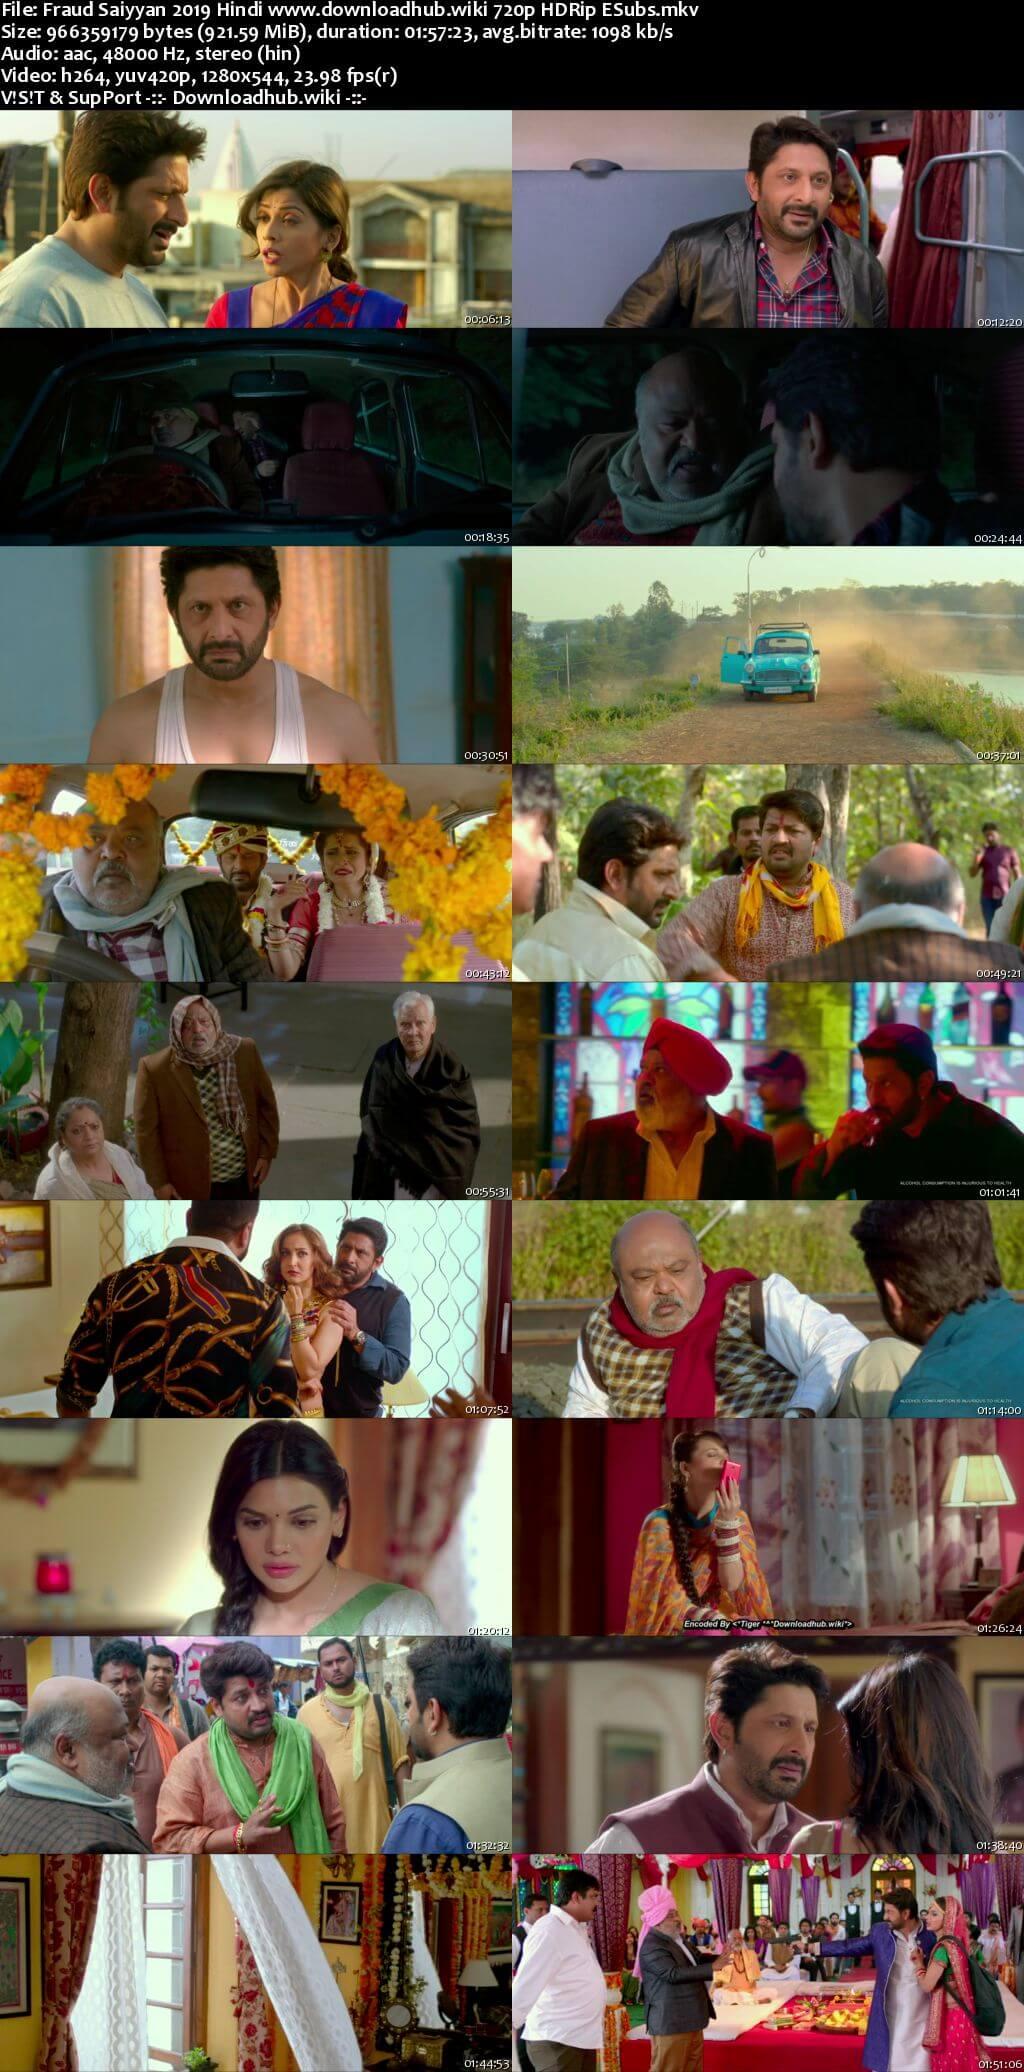 Fraud Saiyyan 2019 Hindi 720p HDRip ESubs